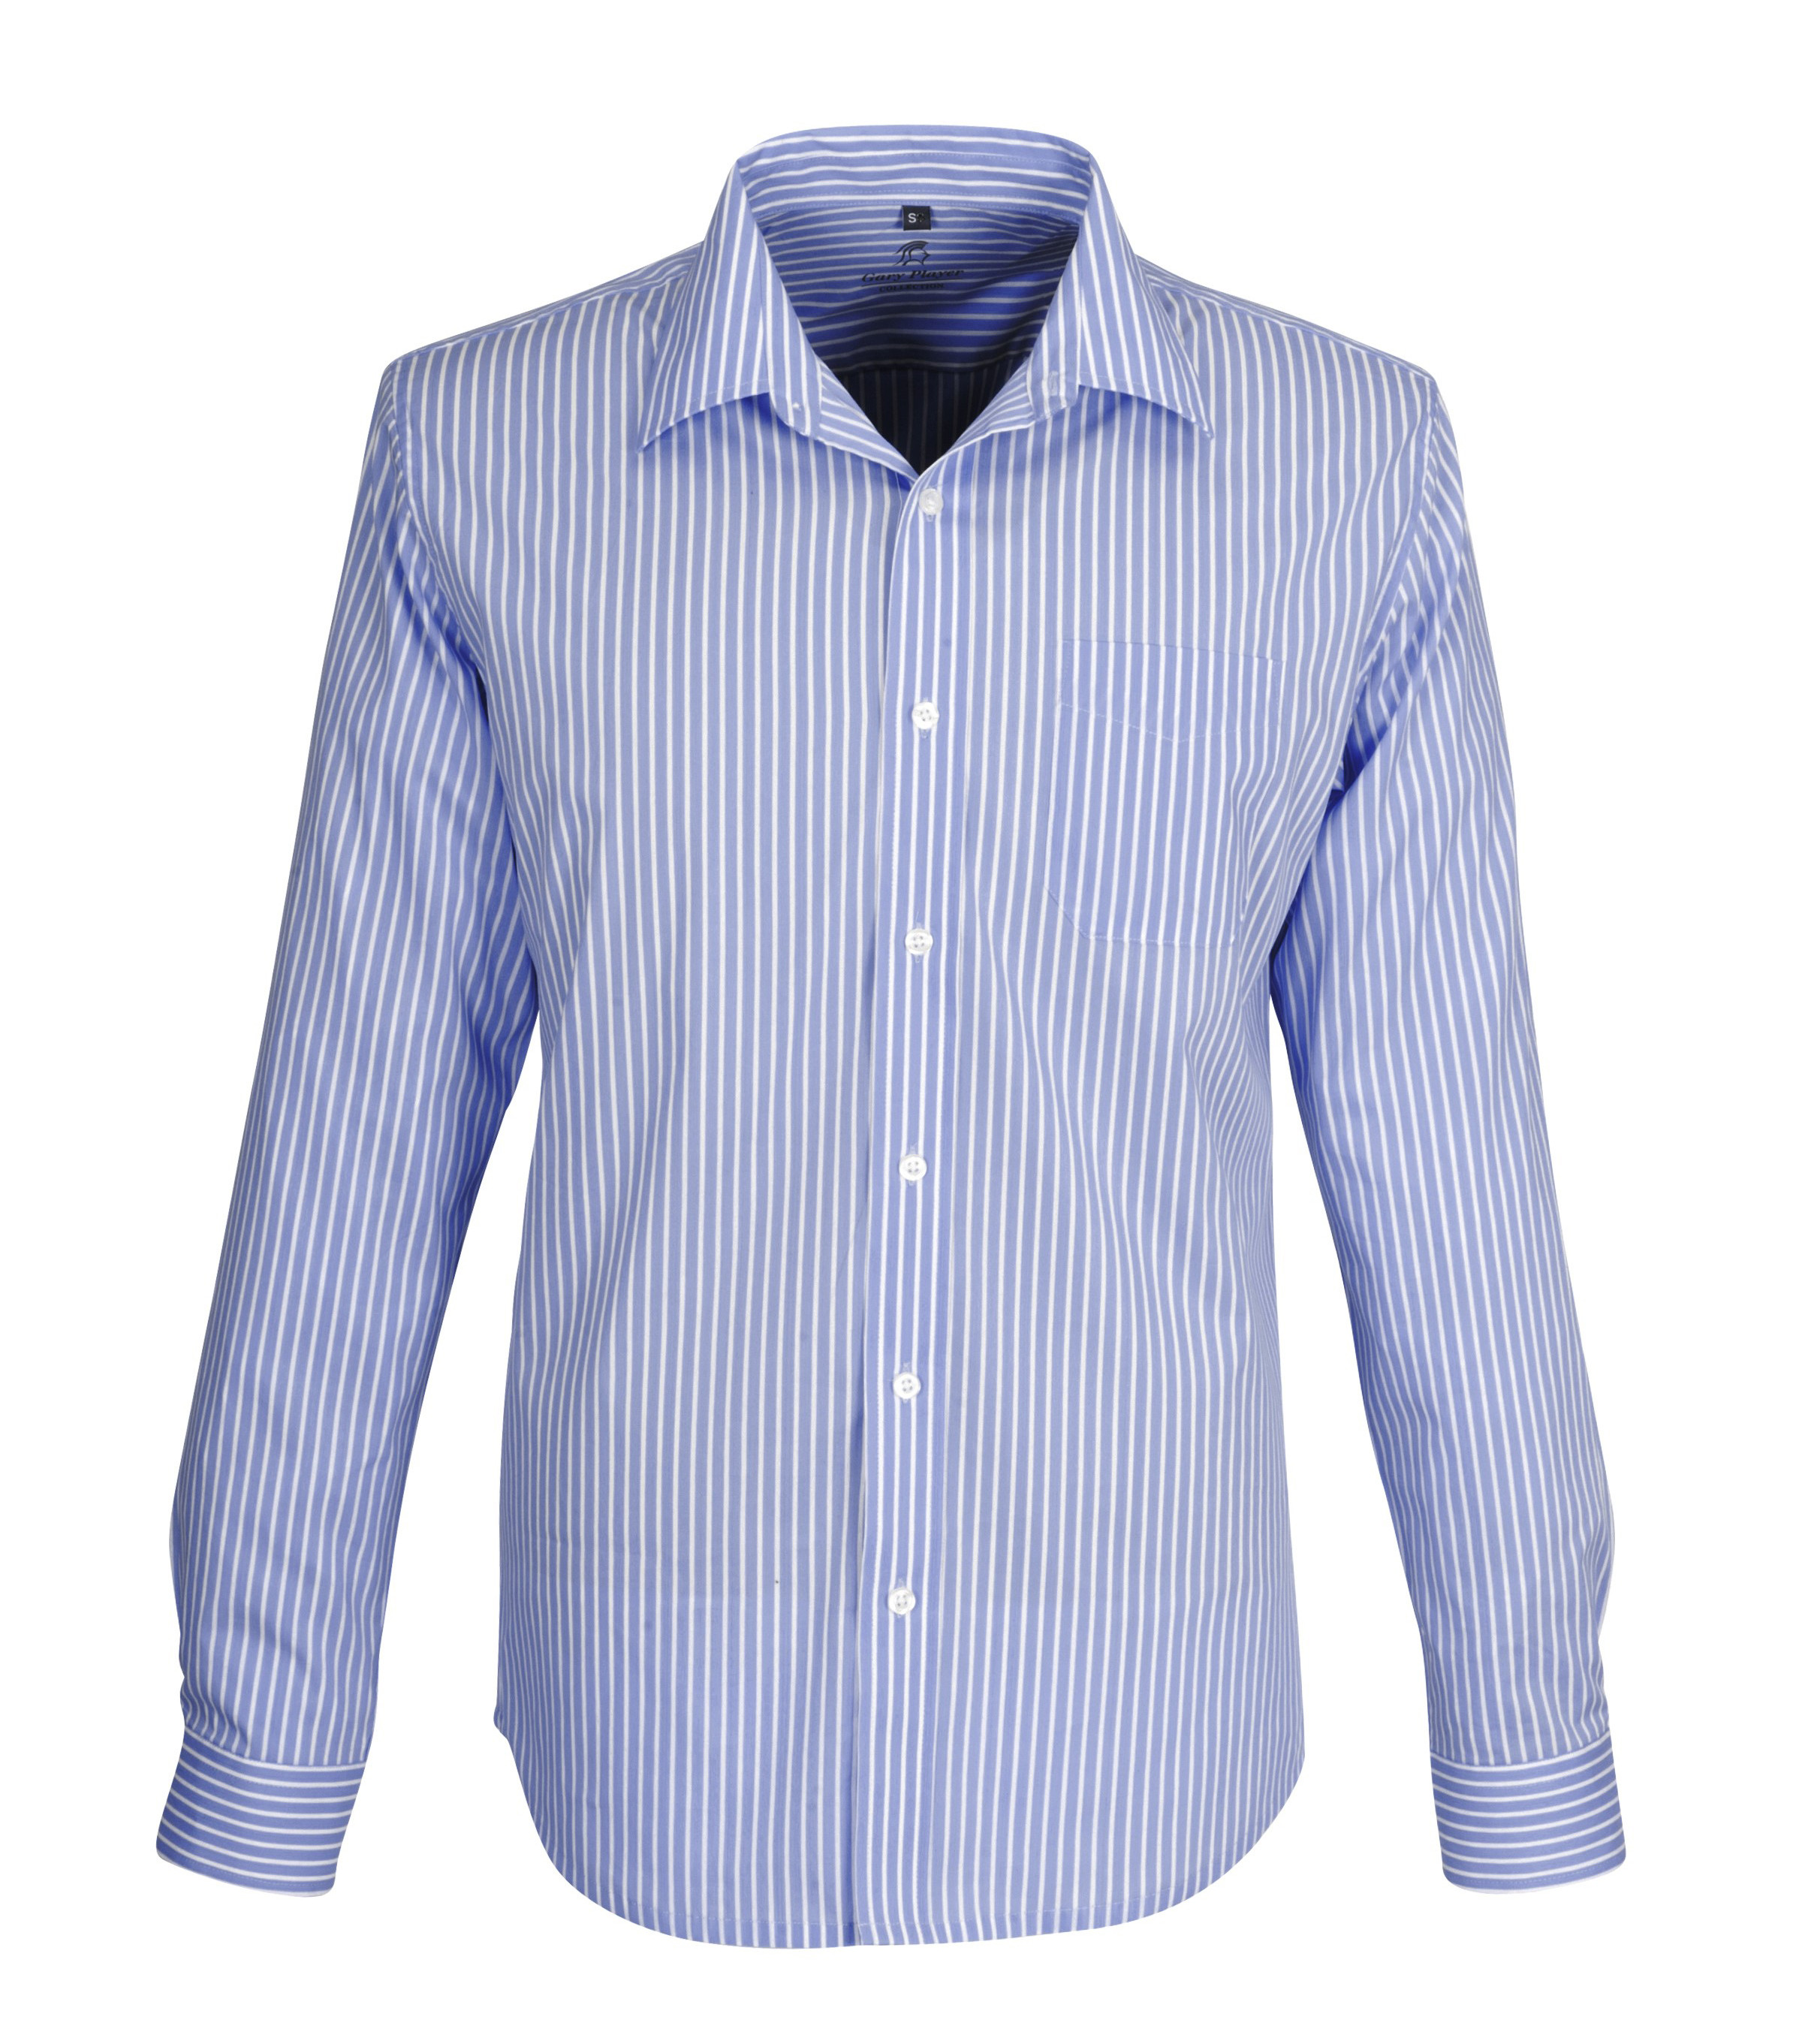 Men's Striped Shirts